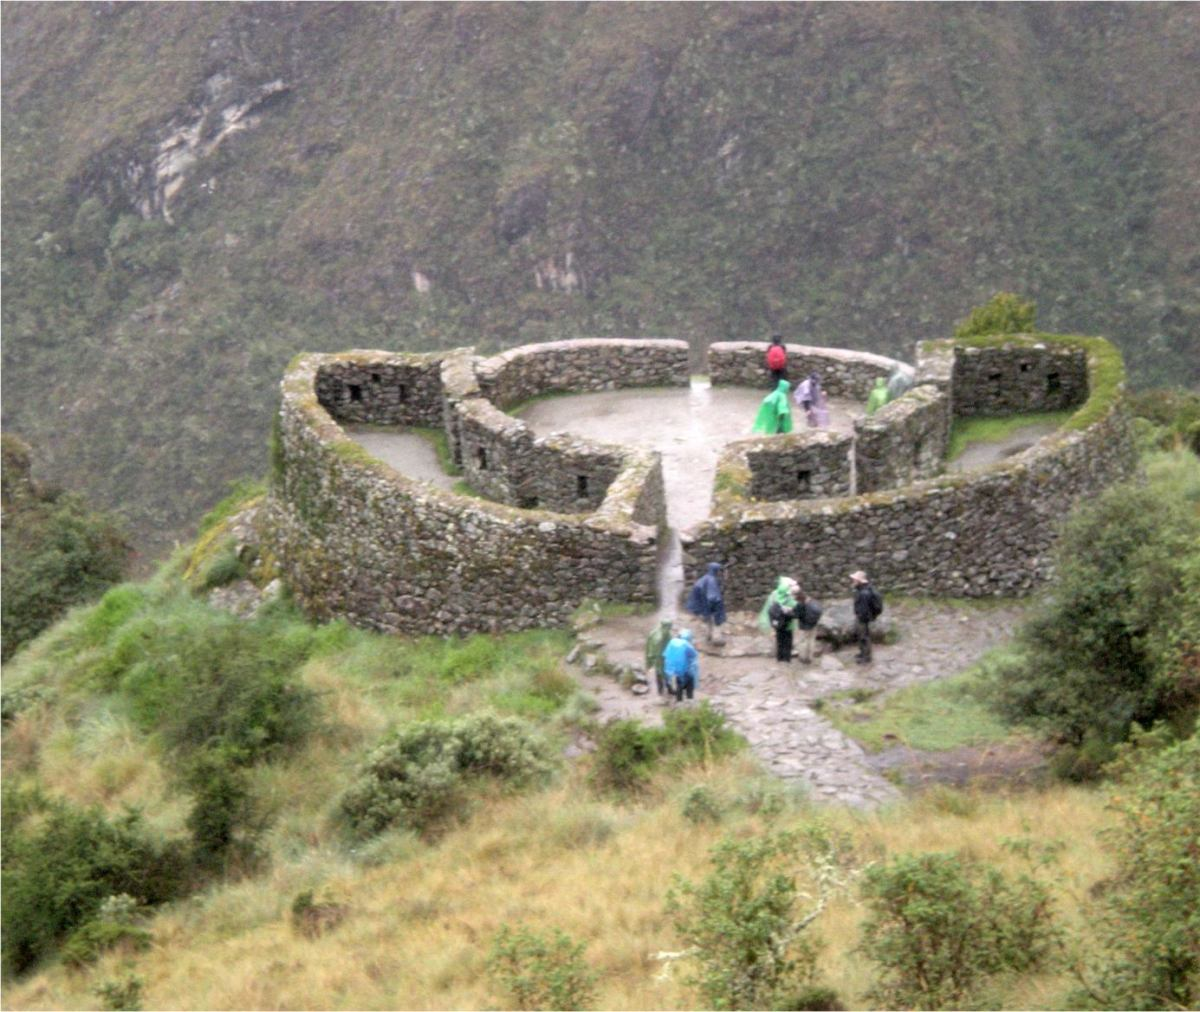 Immer Verfügbare Alternativen zum Inka-Trail, Salkantay-Trail, Lares-Trekk,Choqueuirao.